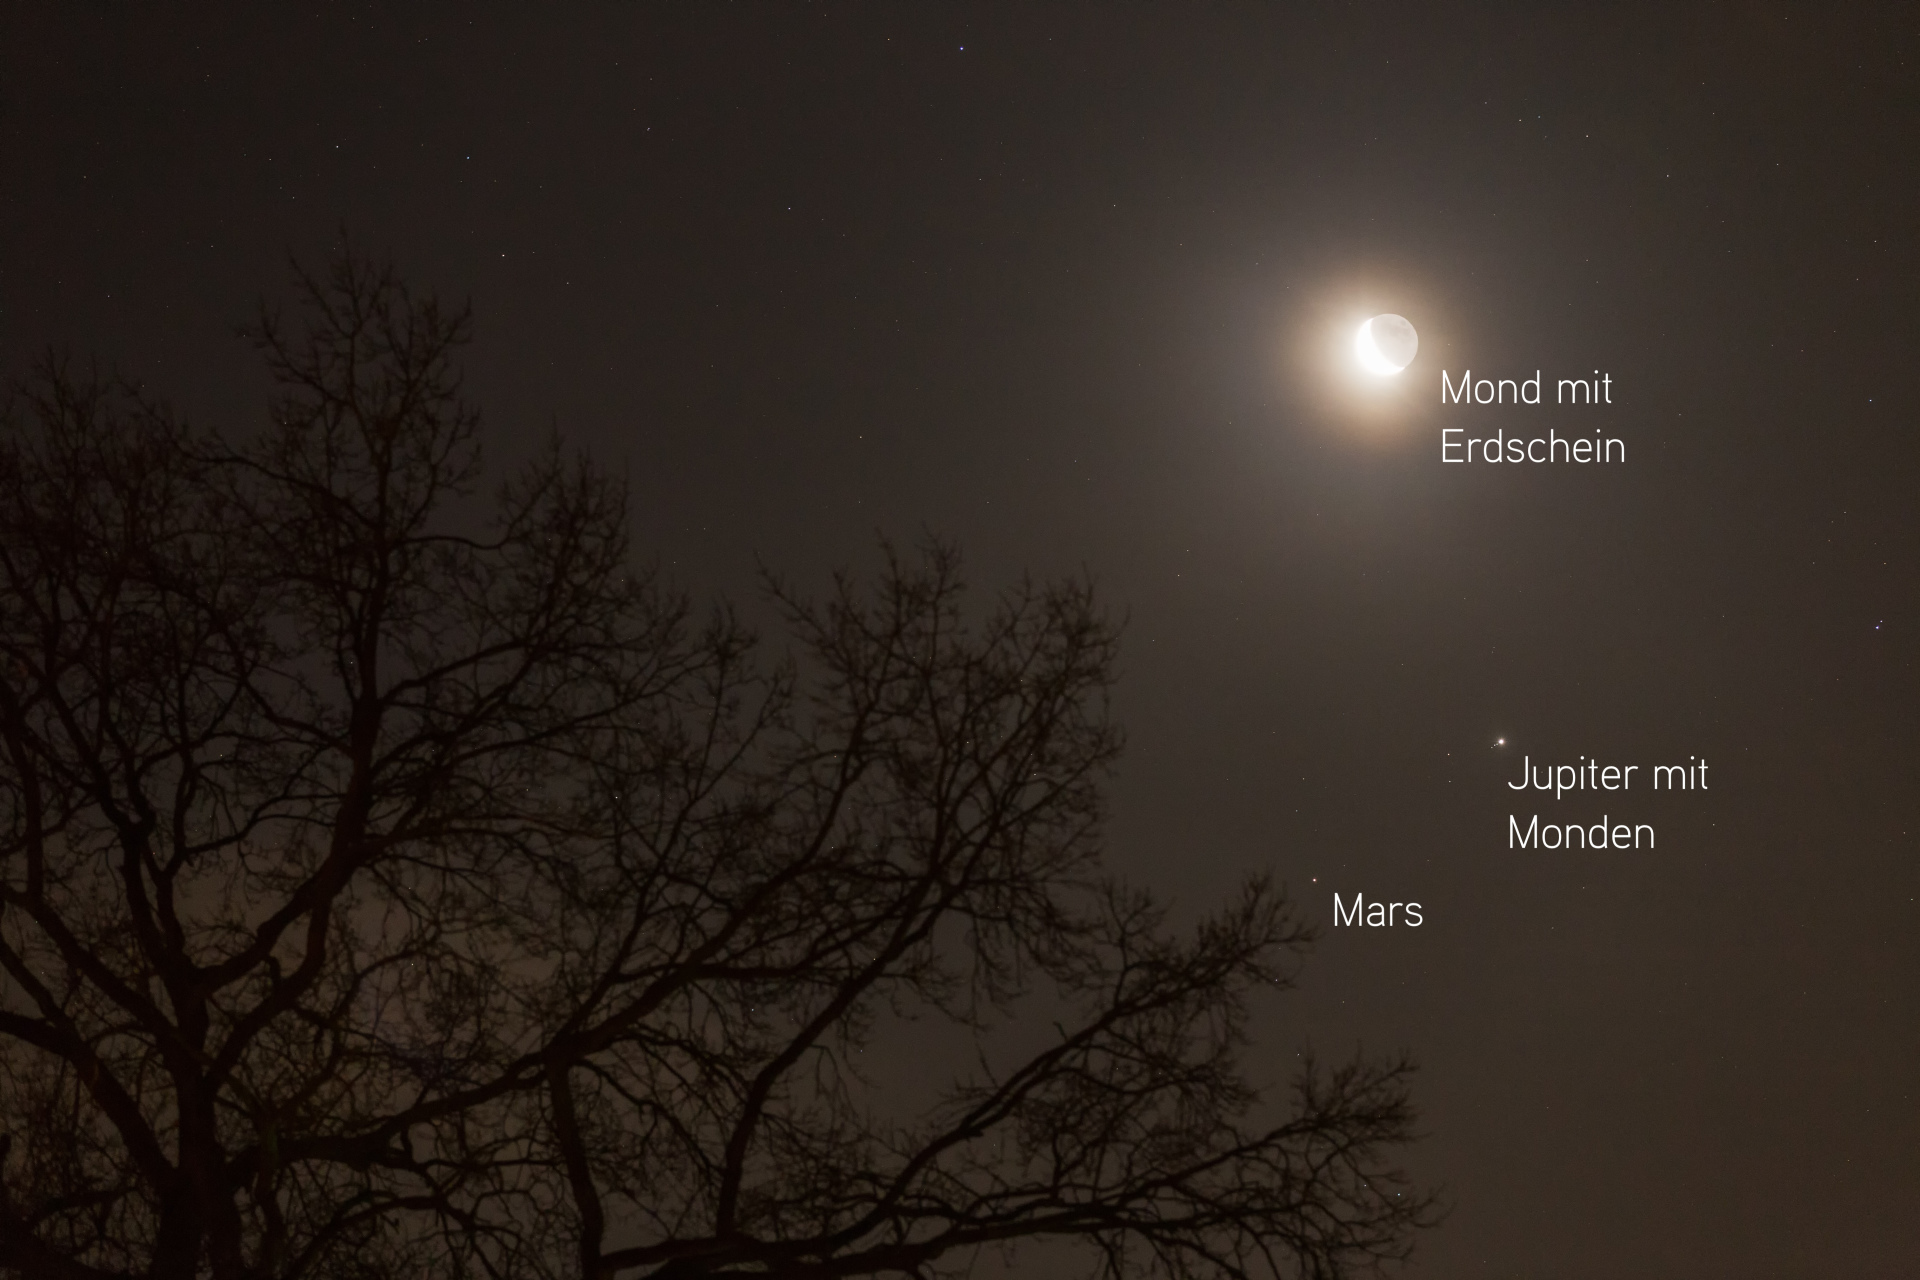 Mars Jupiter Und Der Mond Am Morgenhimmel Im Januar 2018 Benjamin